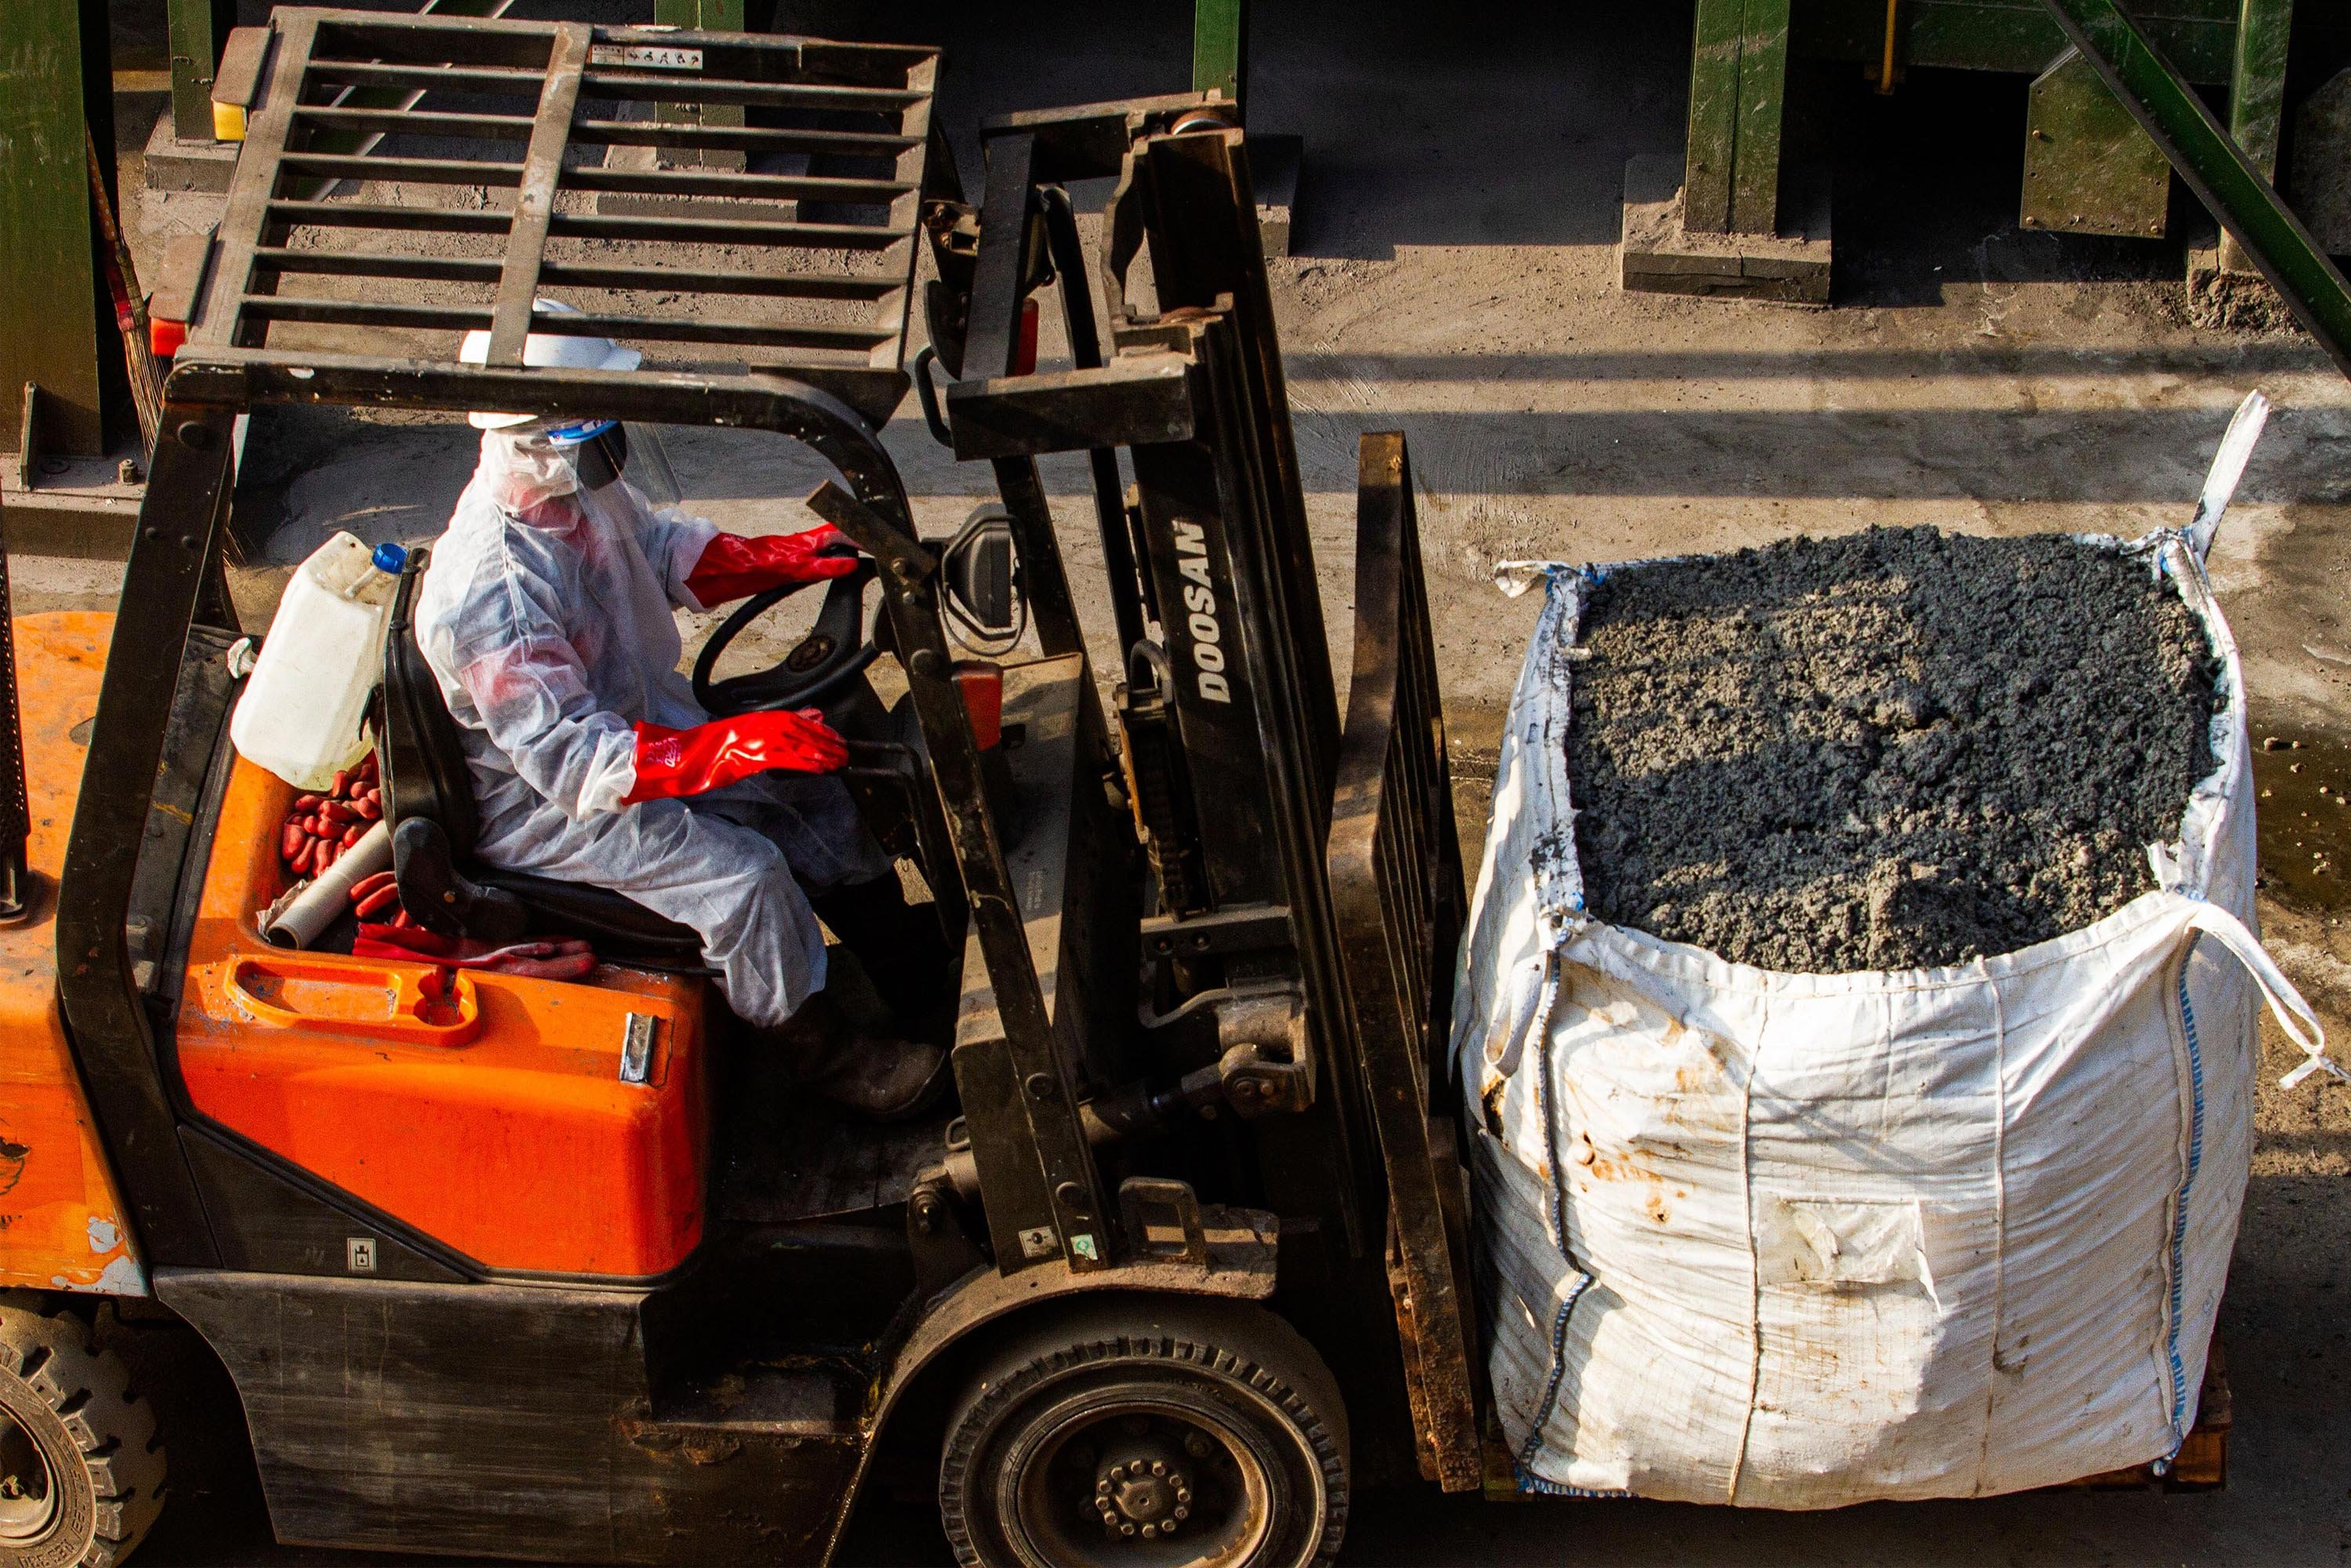 Petugas membawa residu atau abu hasil pembakaran limbah medis infeksius di PT Jasa Medivest, Plant Dawuan, Karawang, Jawa Barat.